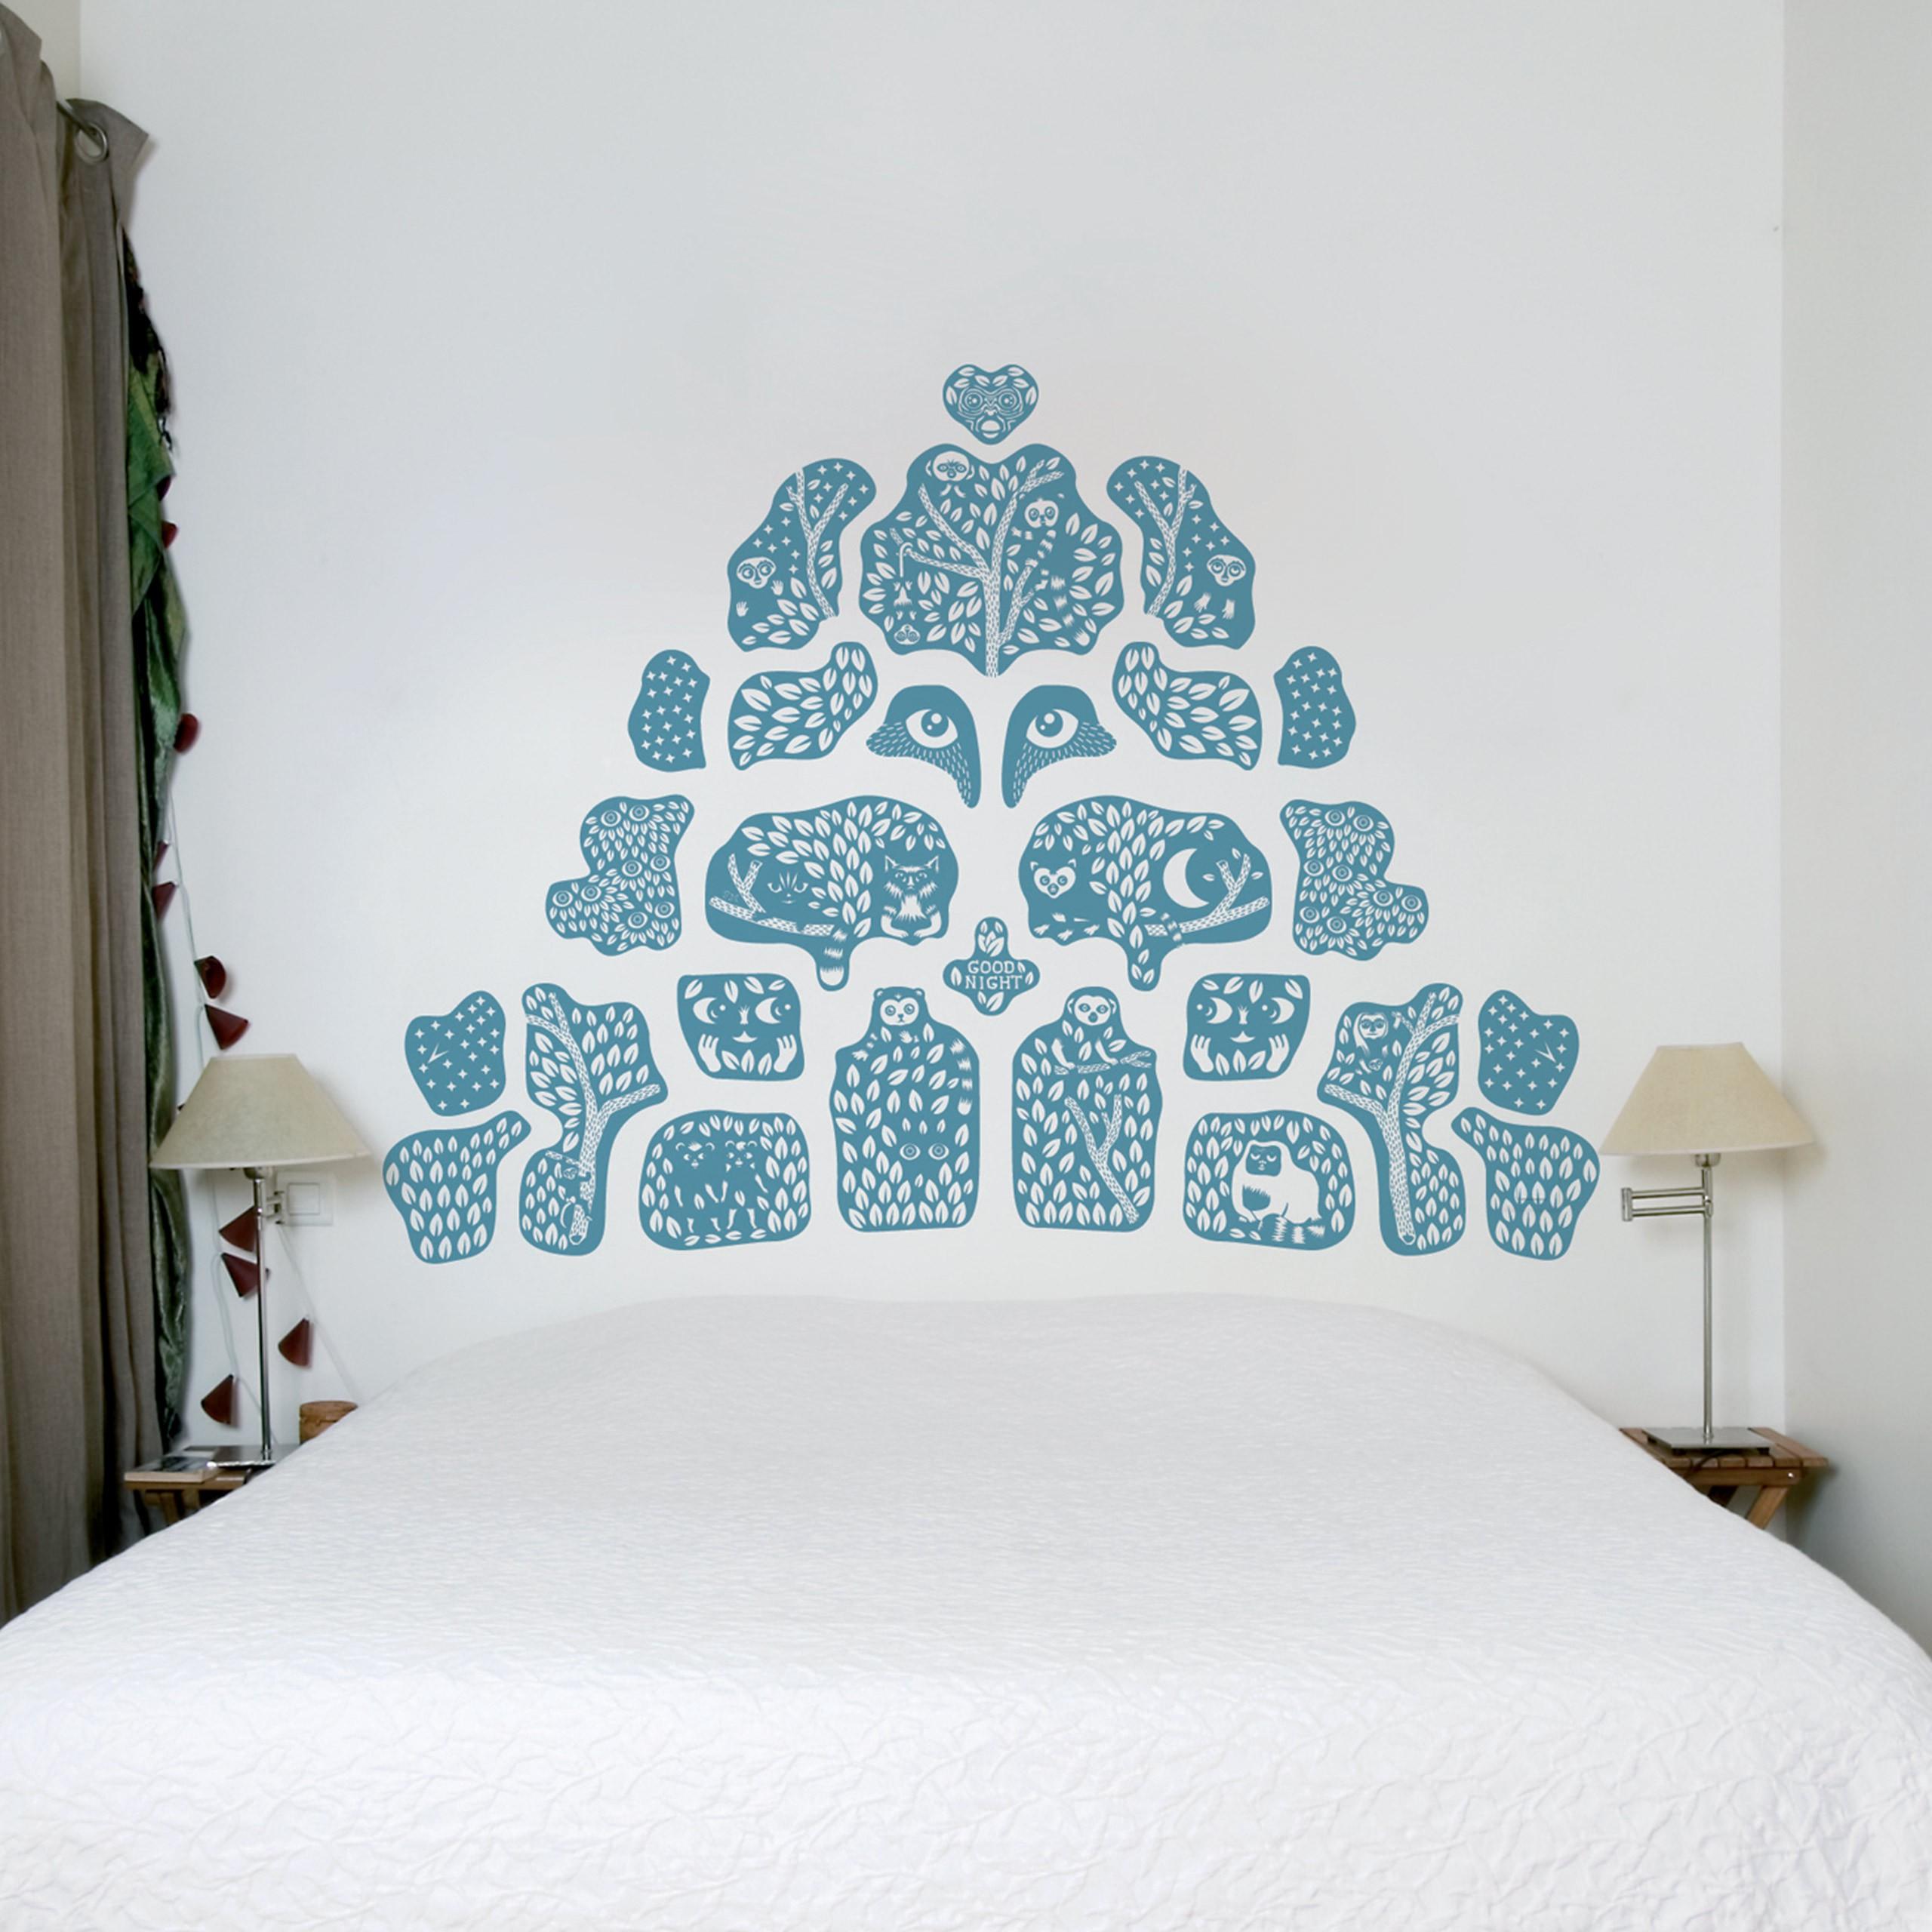 Good night large blue